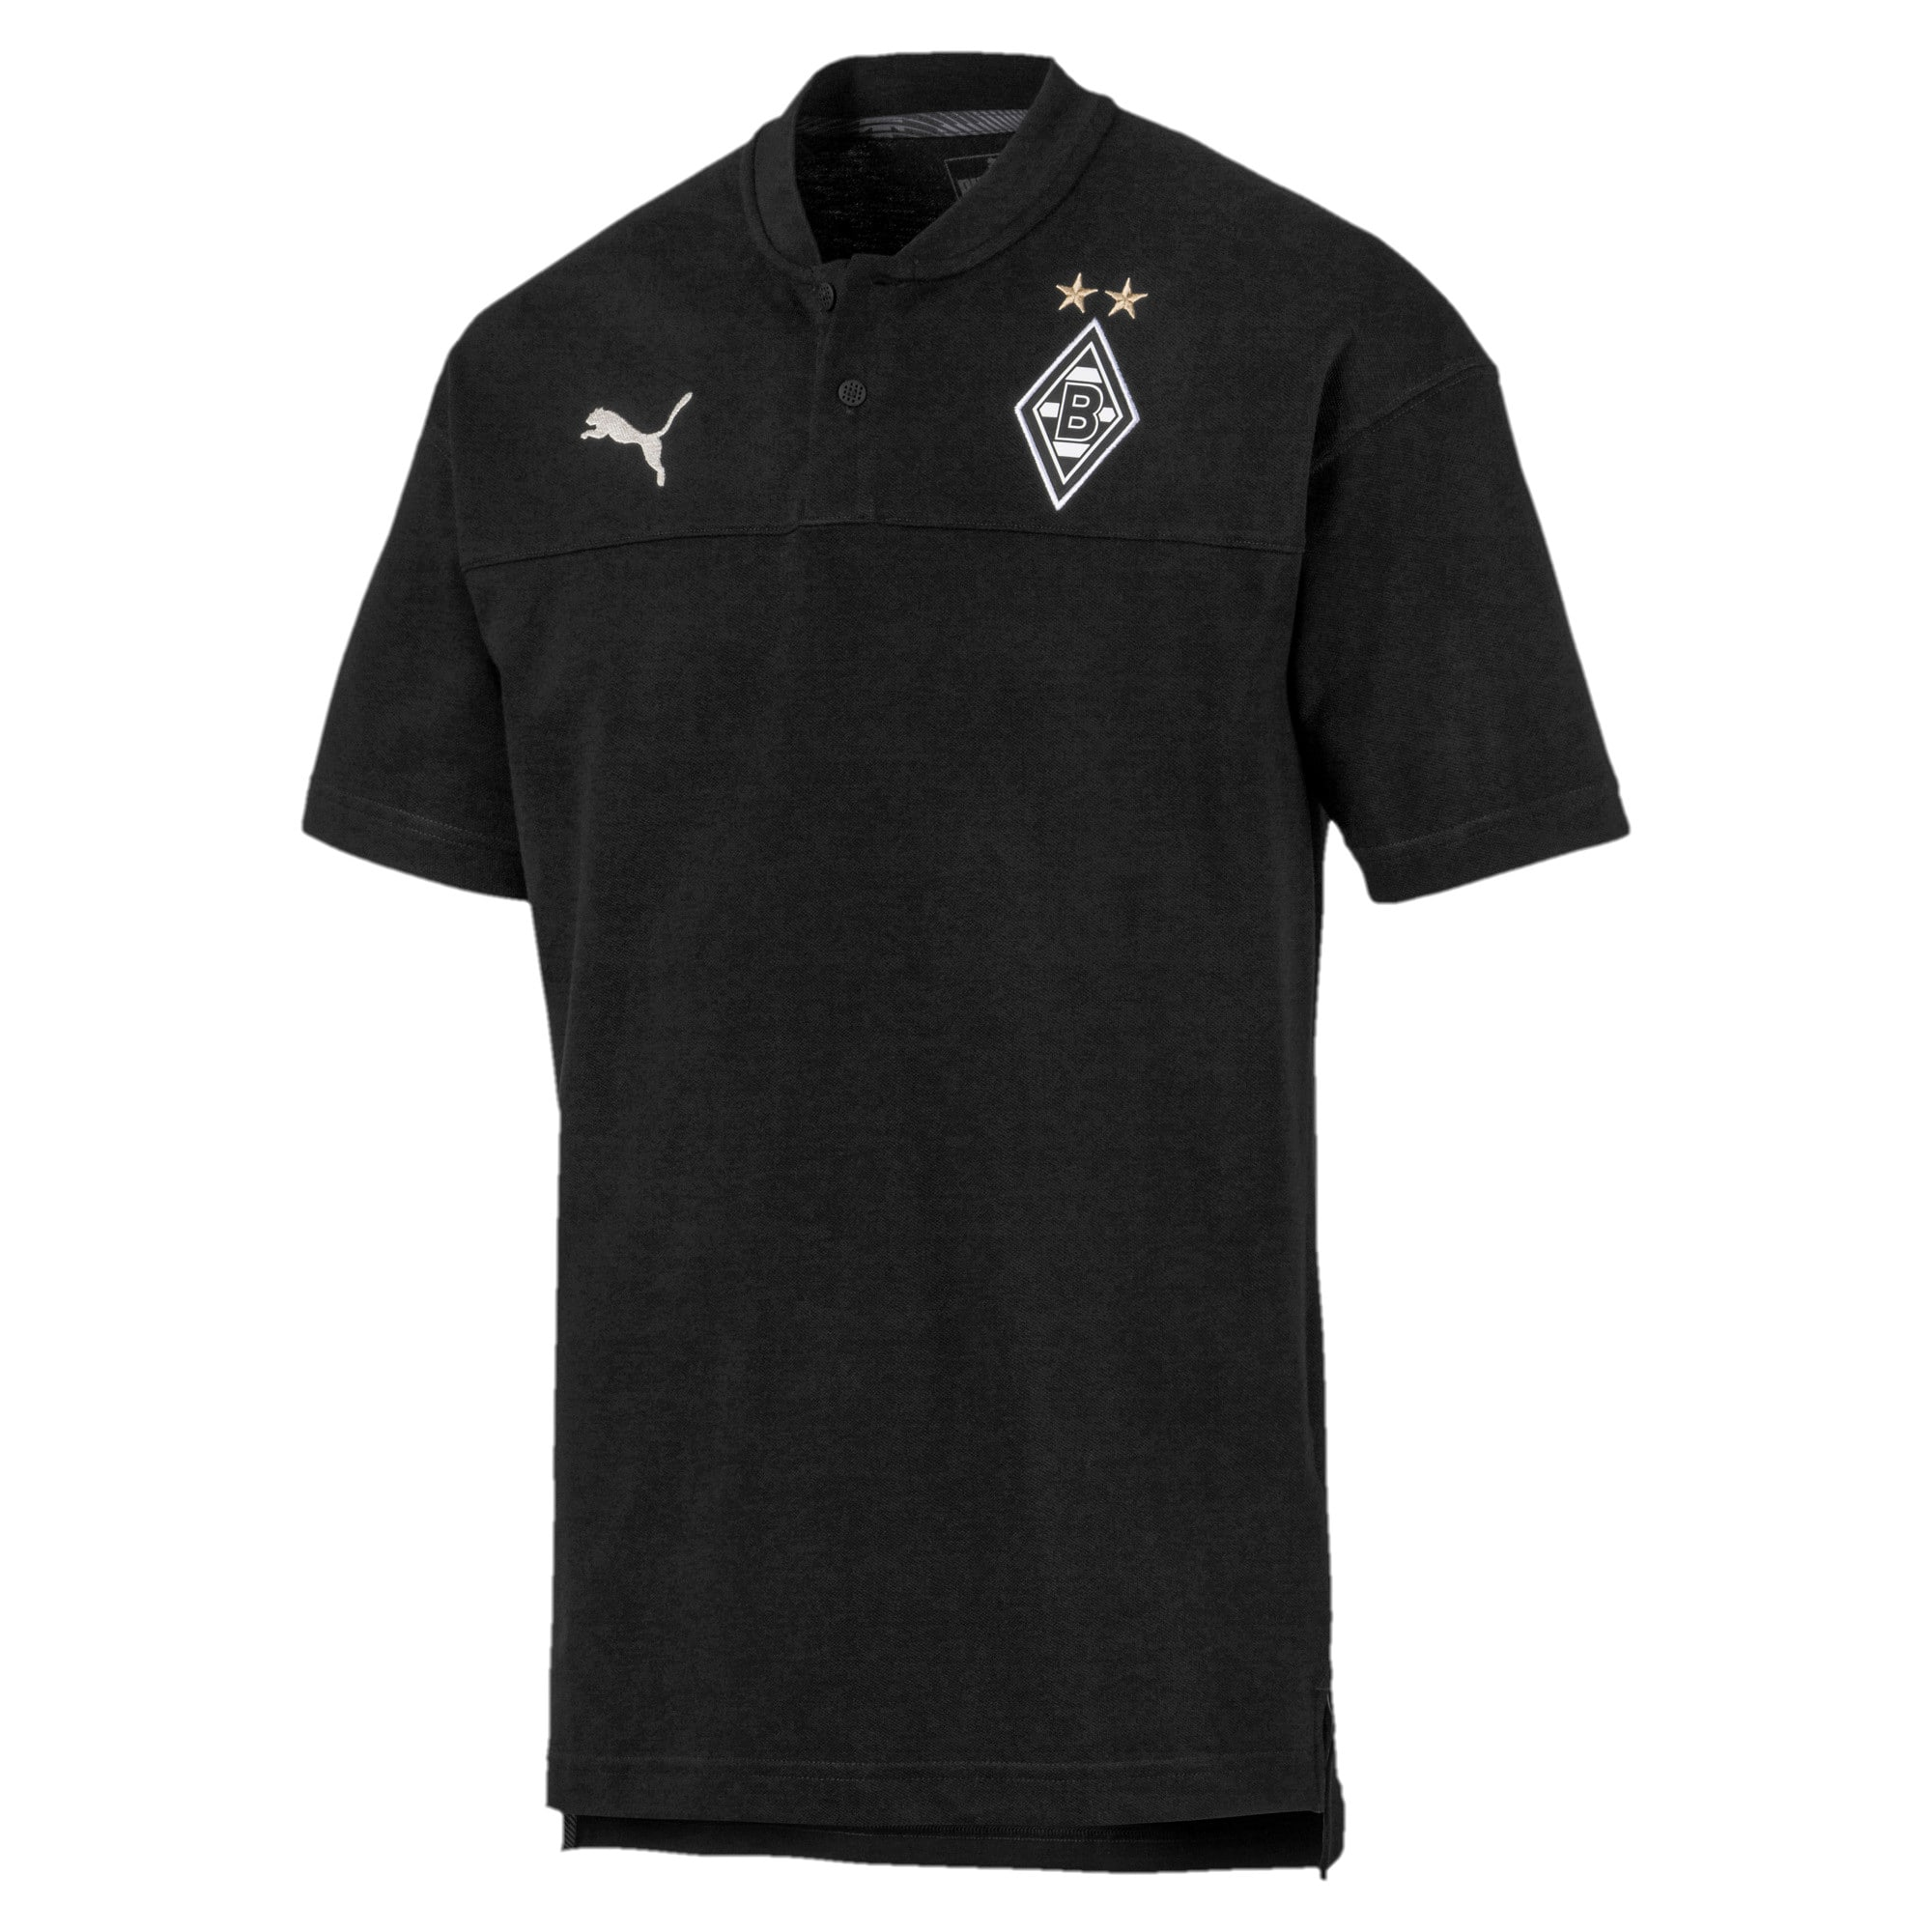 Thumbnail 4 of Borussia Mönchengladbach Casuals poloshirt voor heren, Puma Black-Phantom Black, medium